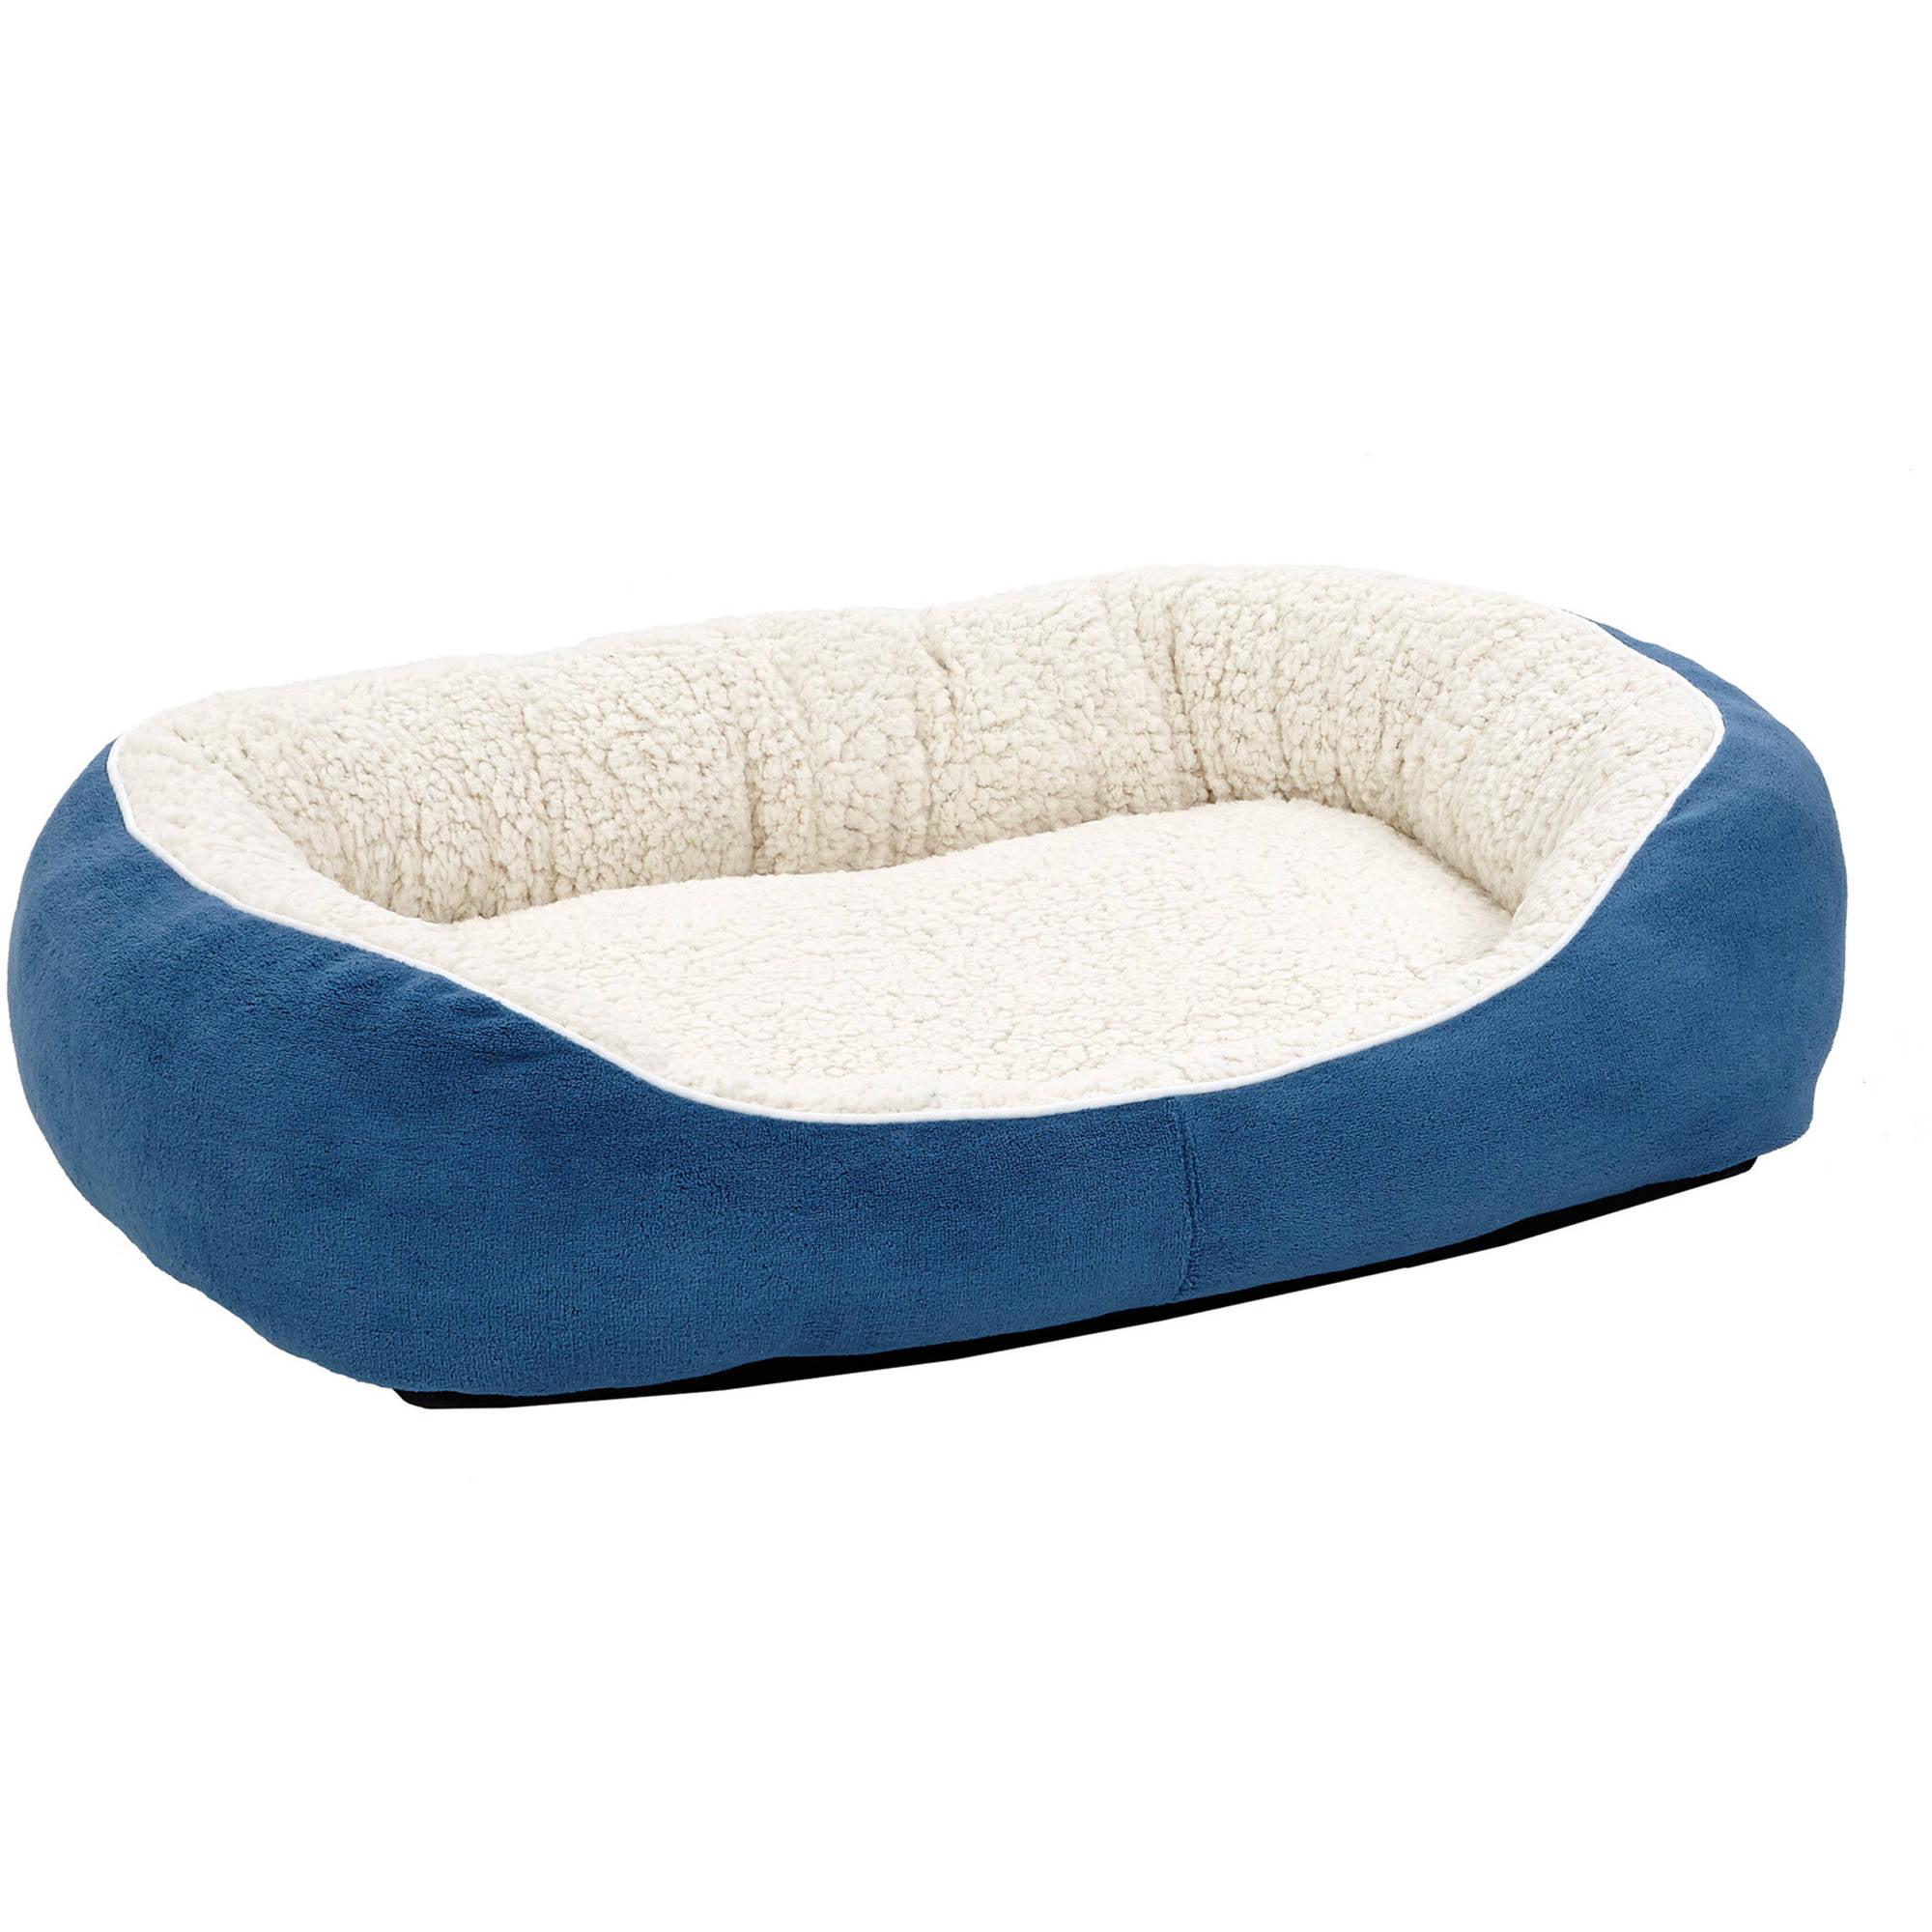 Midwest Medium Blue Cuddle Bed Walmart